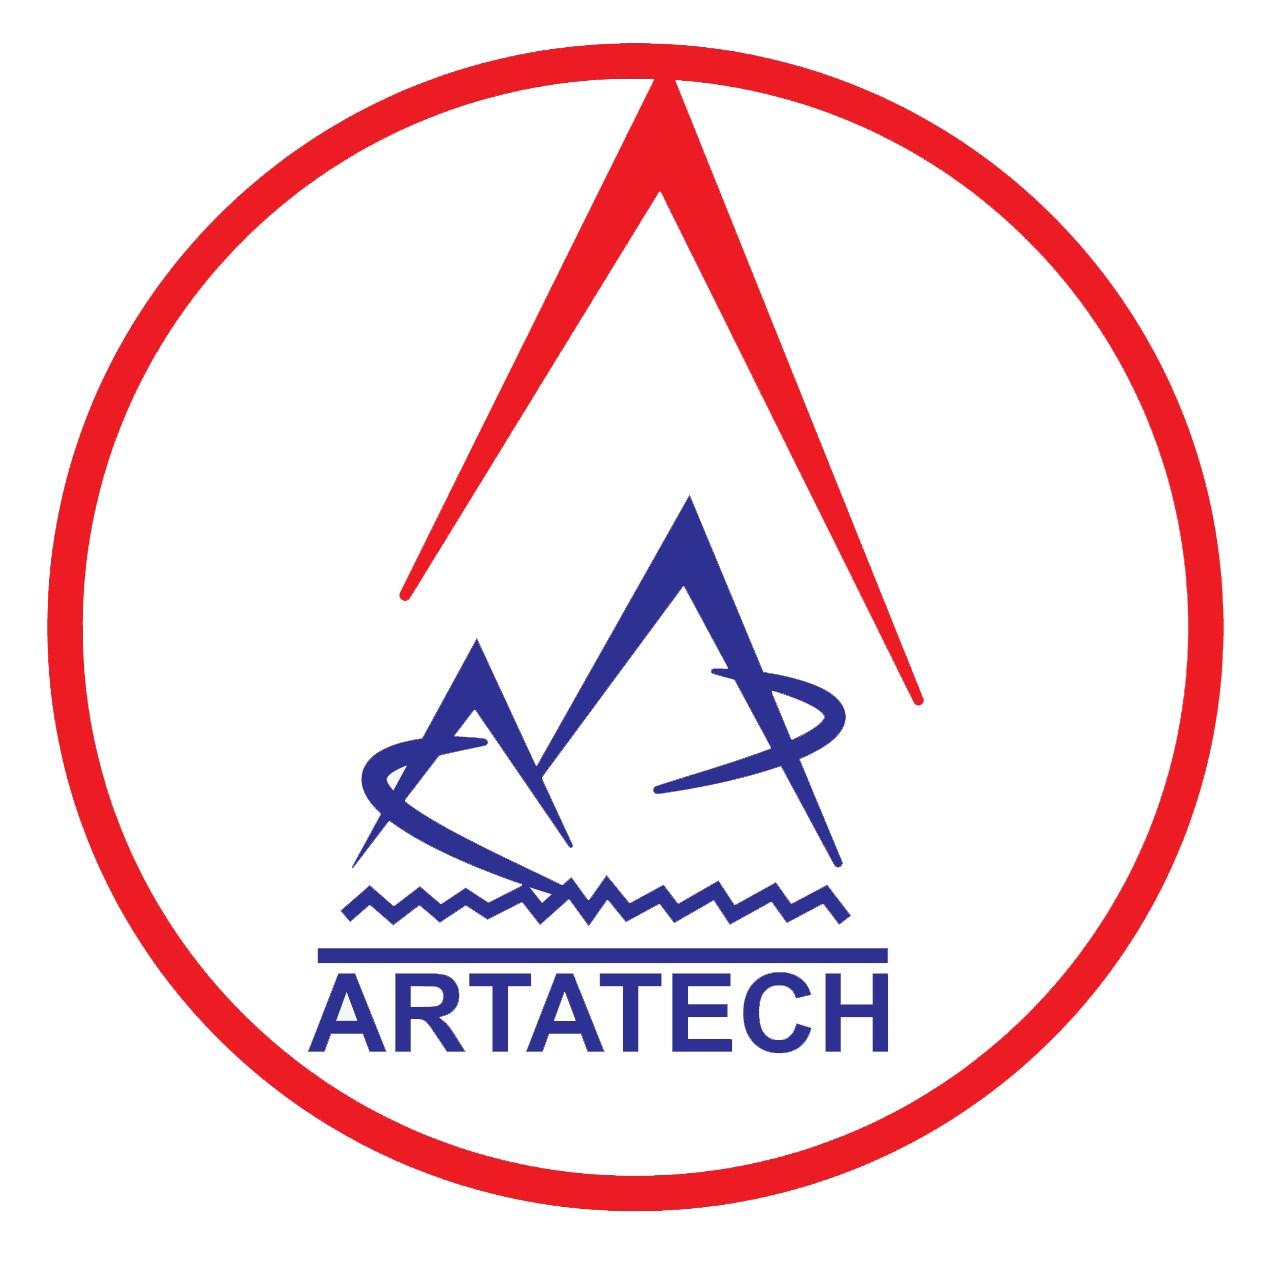 Logo Artatech Jaya Sempurna